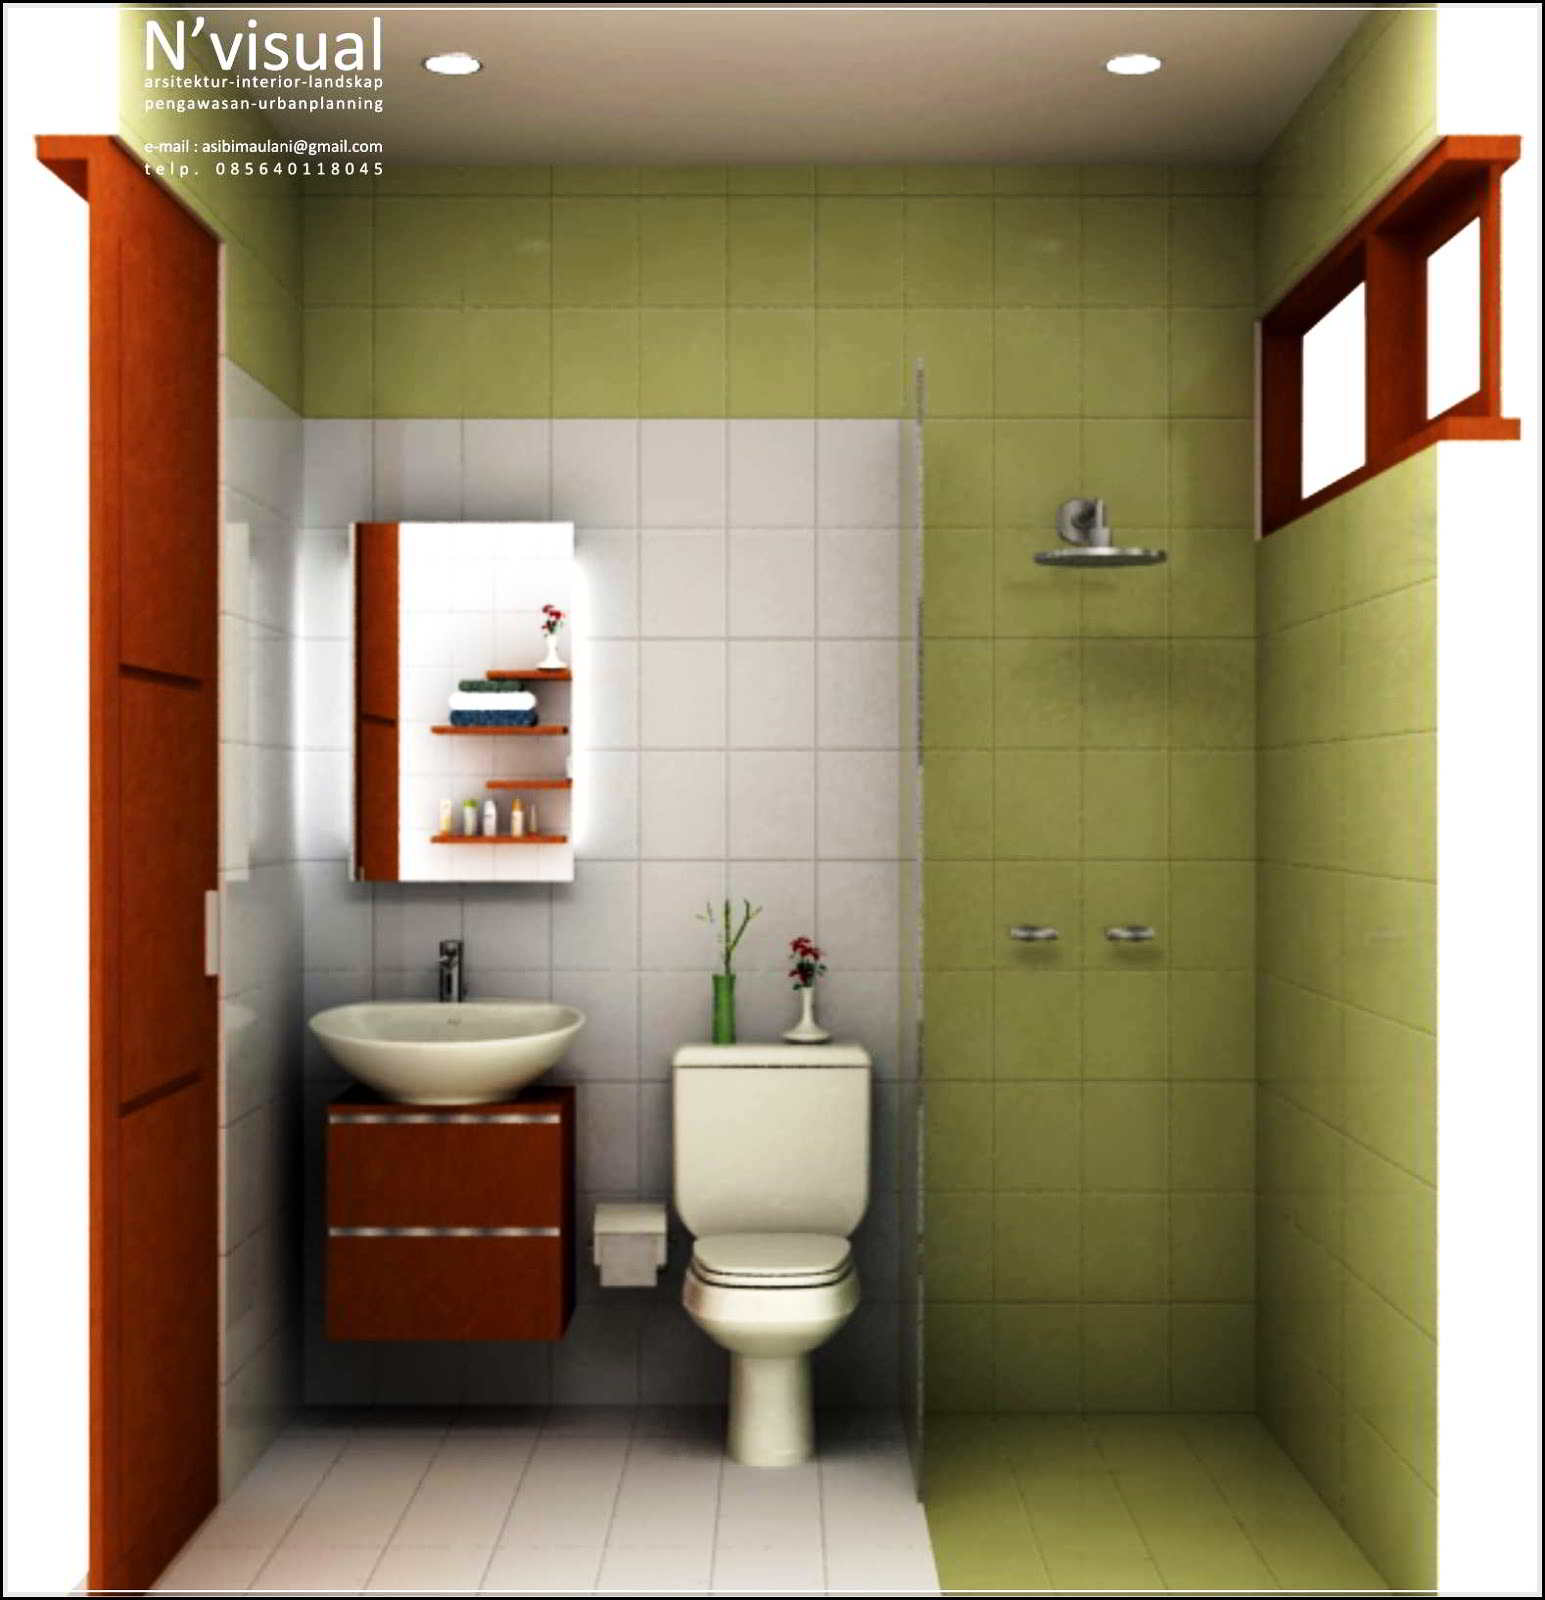 45 Desain Kamar Mandi Minimalis Kecil Sederhana Bernuansa Modern